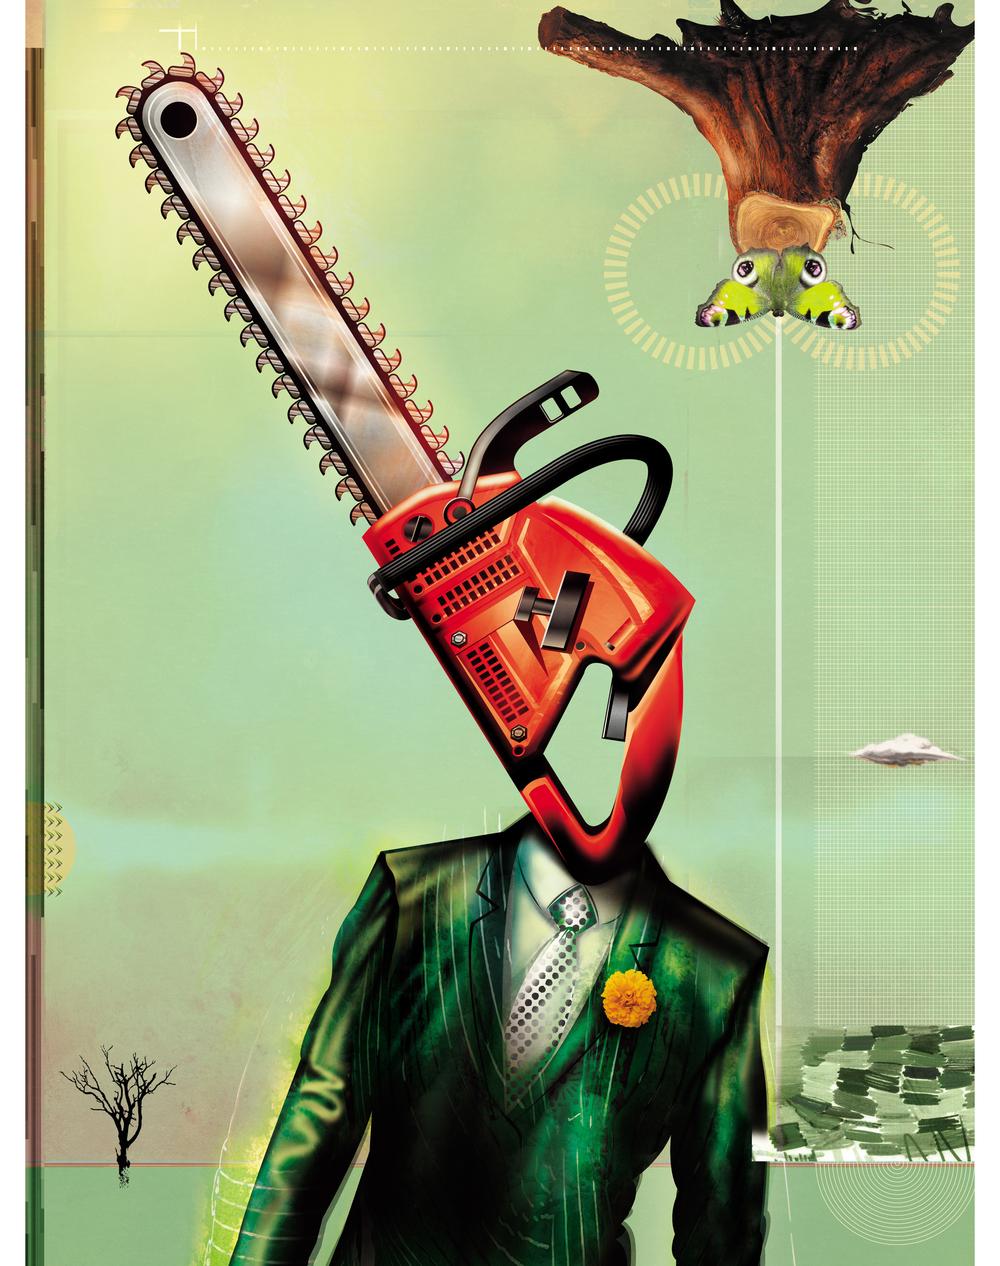 17_Chainsaw.jpg